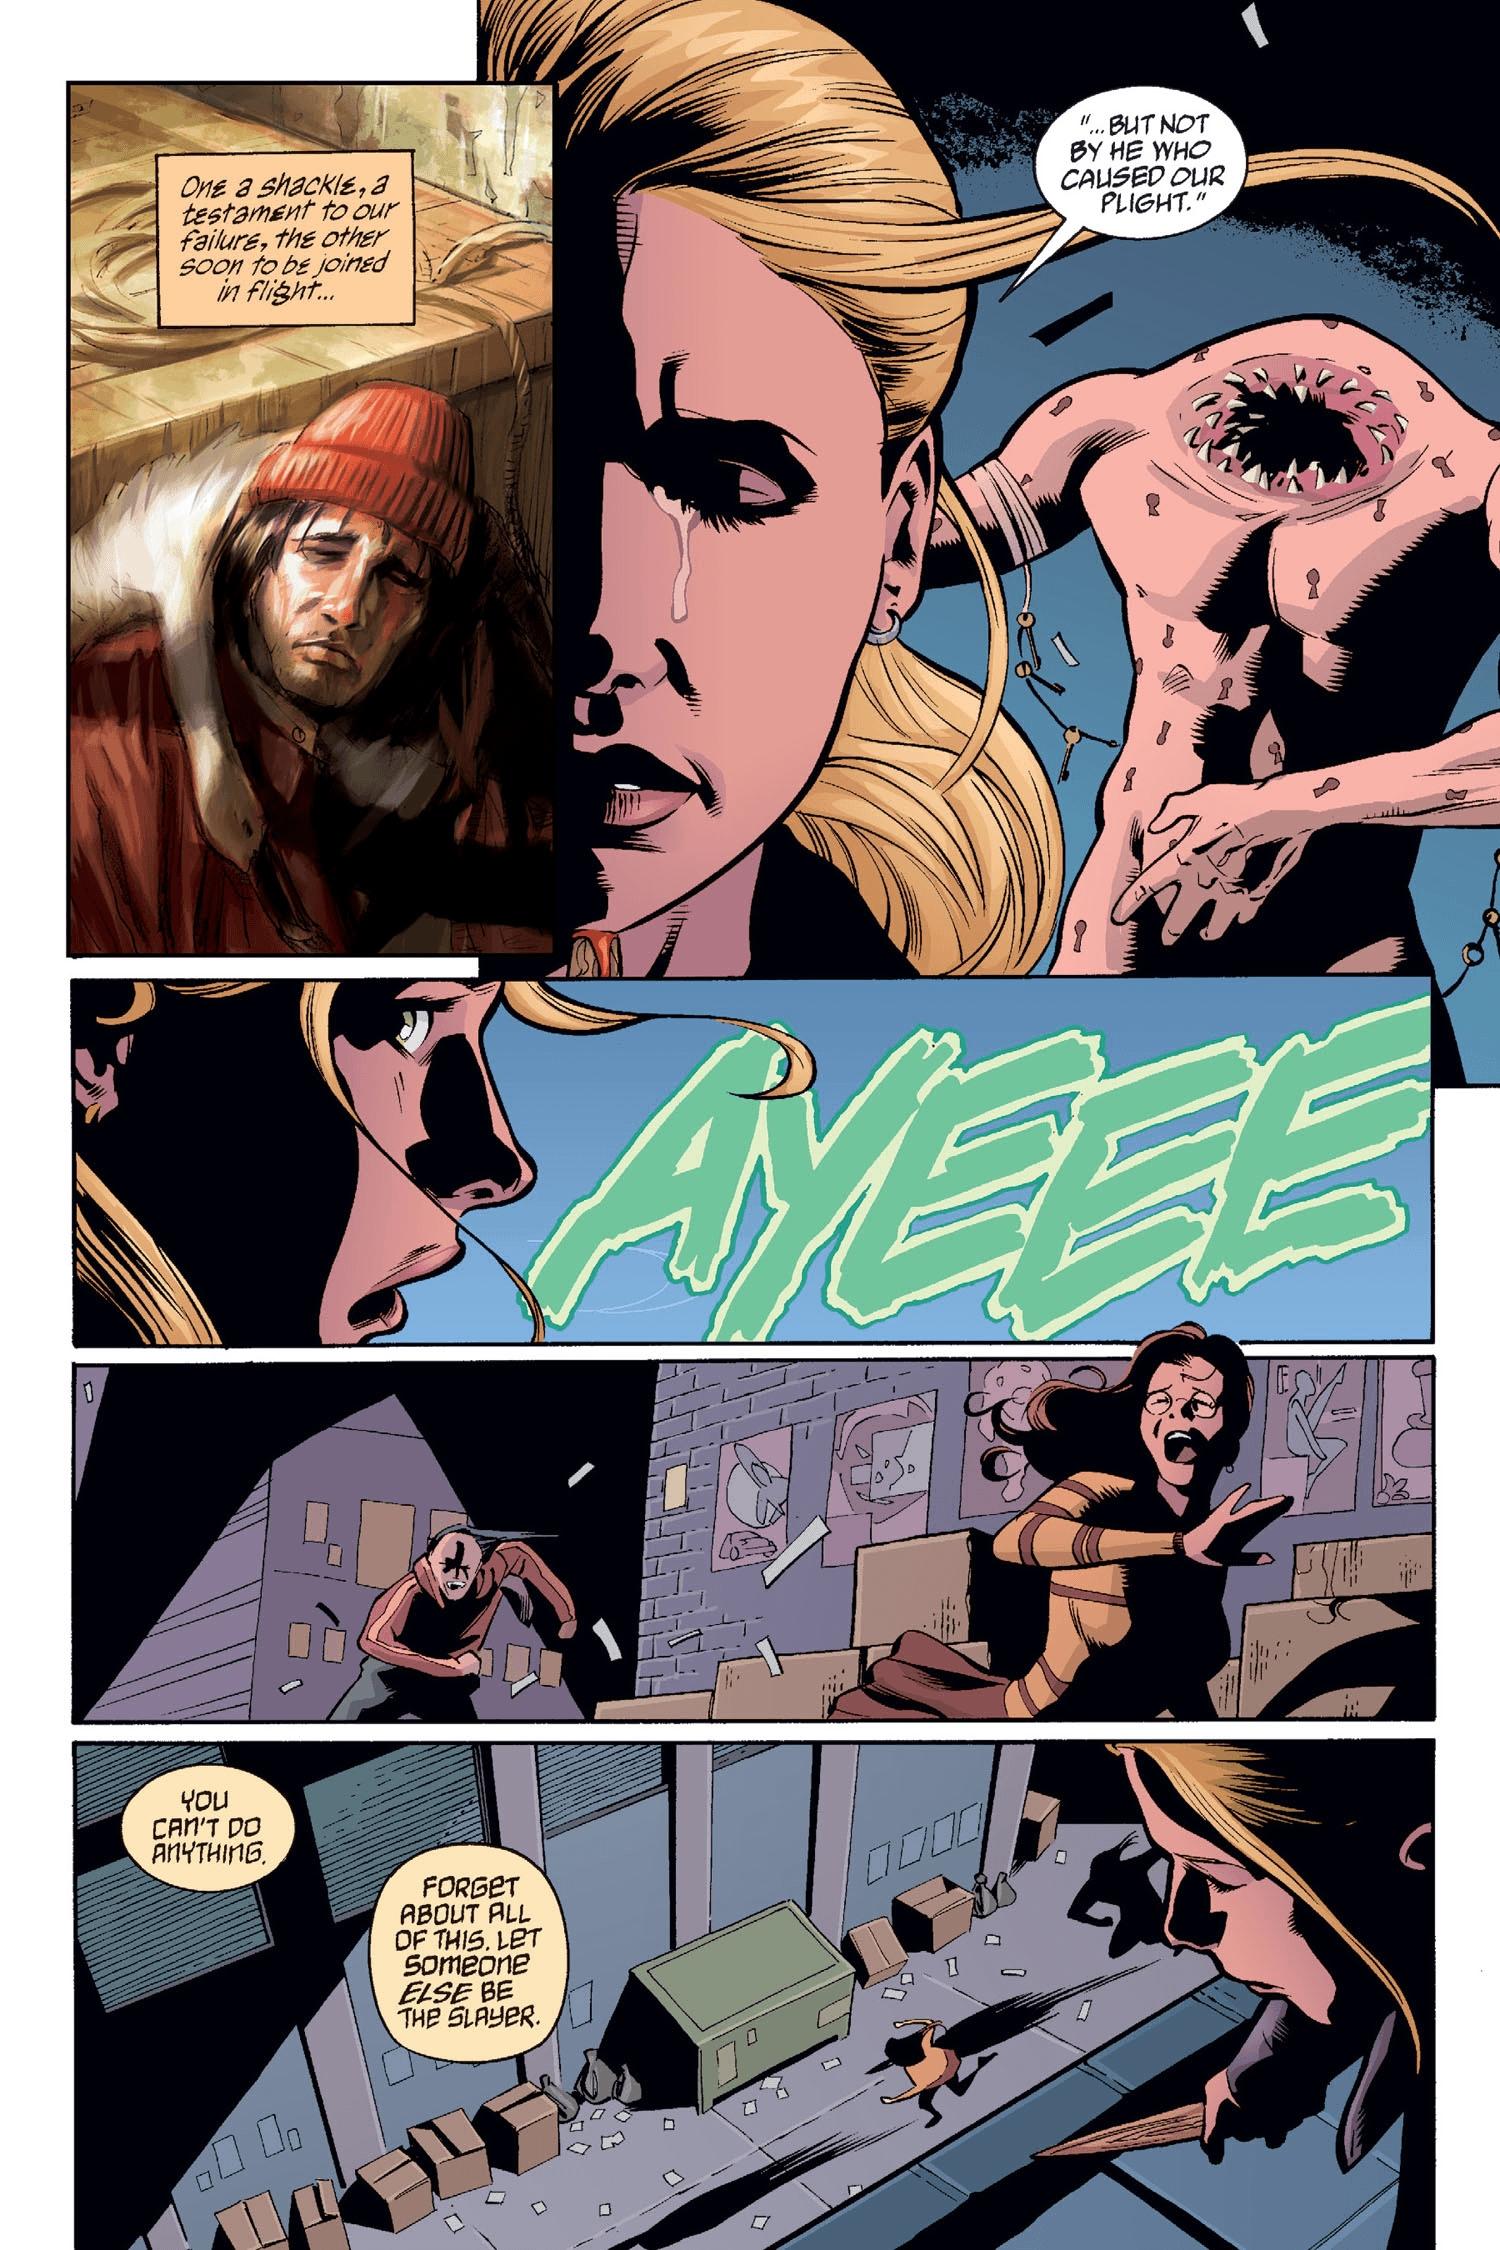 Read online Buffy the Vampire Slayer: Omnibus comic -  Issue # TPB 2 - 60